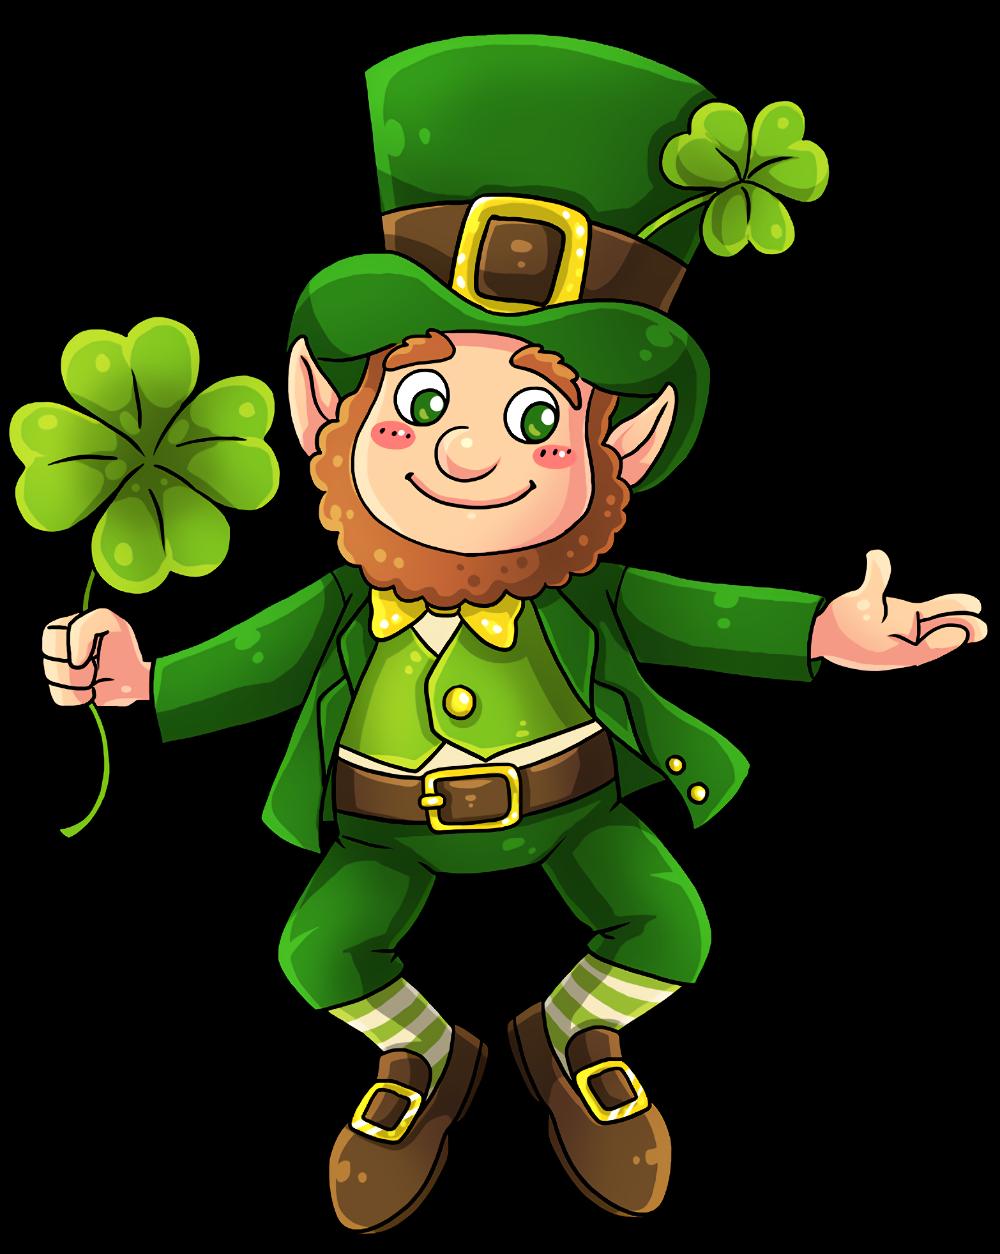 St Patricks Day Cartoon Leprechaun Png St Patricks Day Clipart Leprechaun Clipart Saint Patricks Day Art